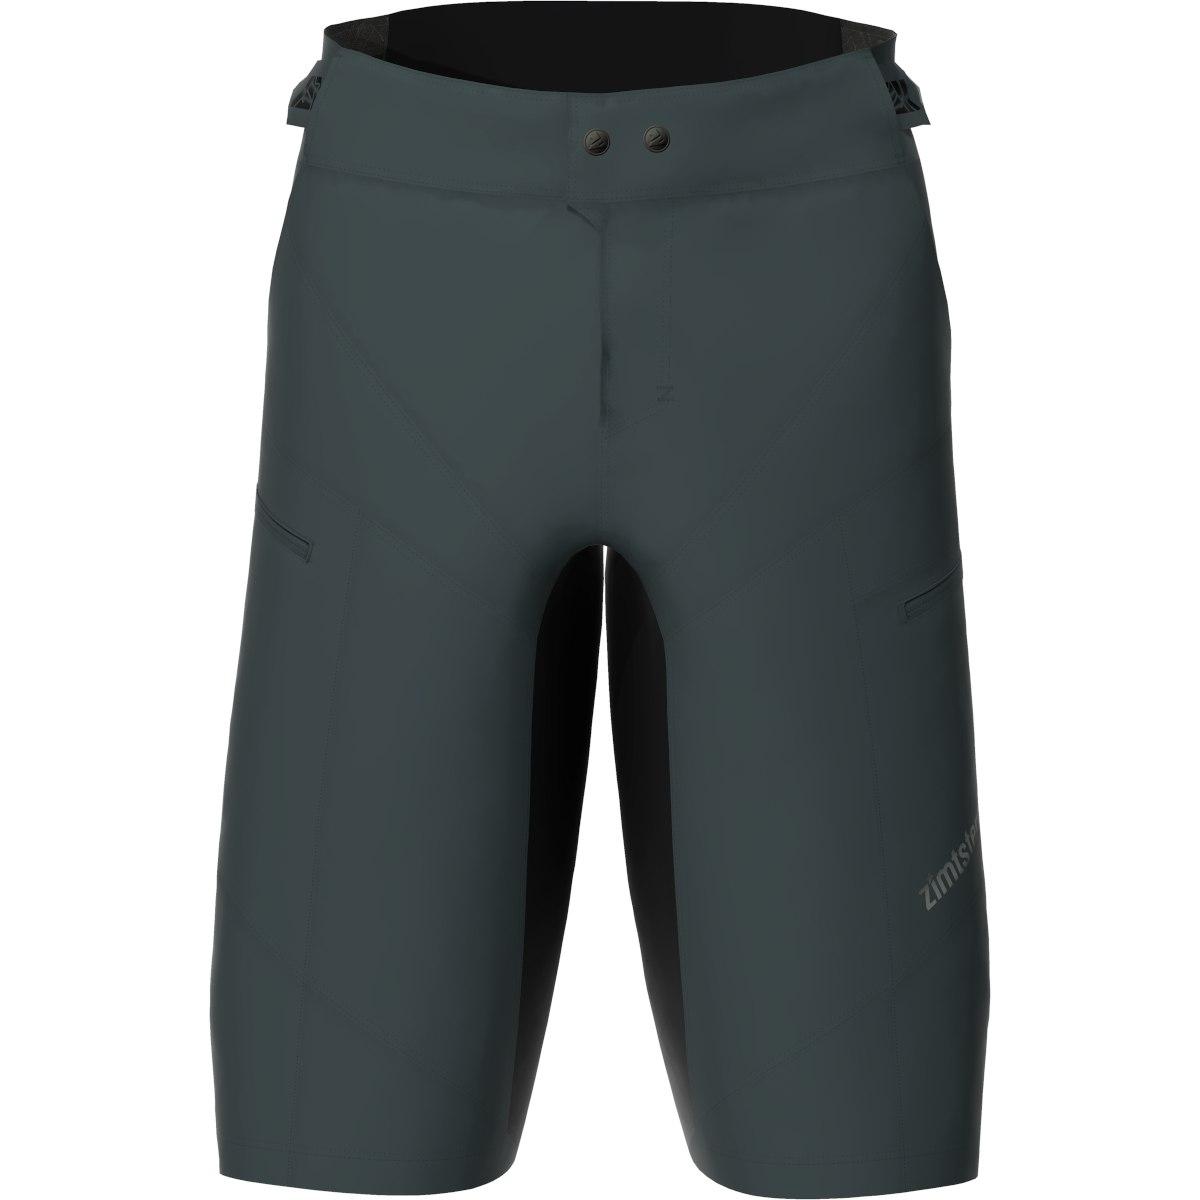 Bild von Zimtstern Trailstar Evo MTB-Shorts - pirate black/black